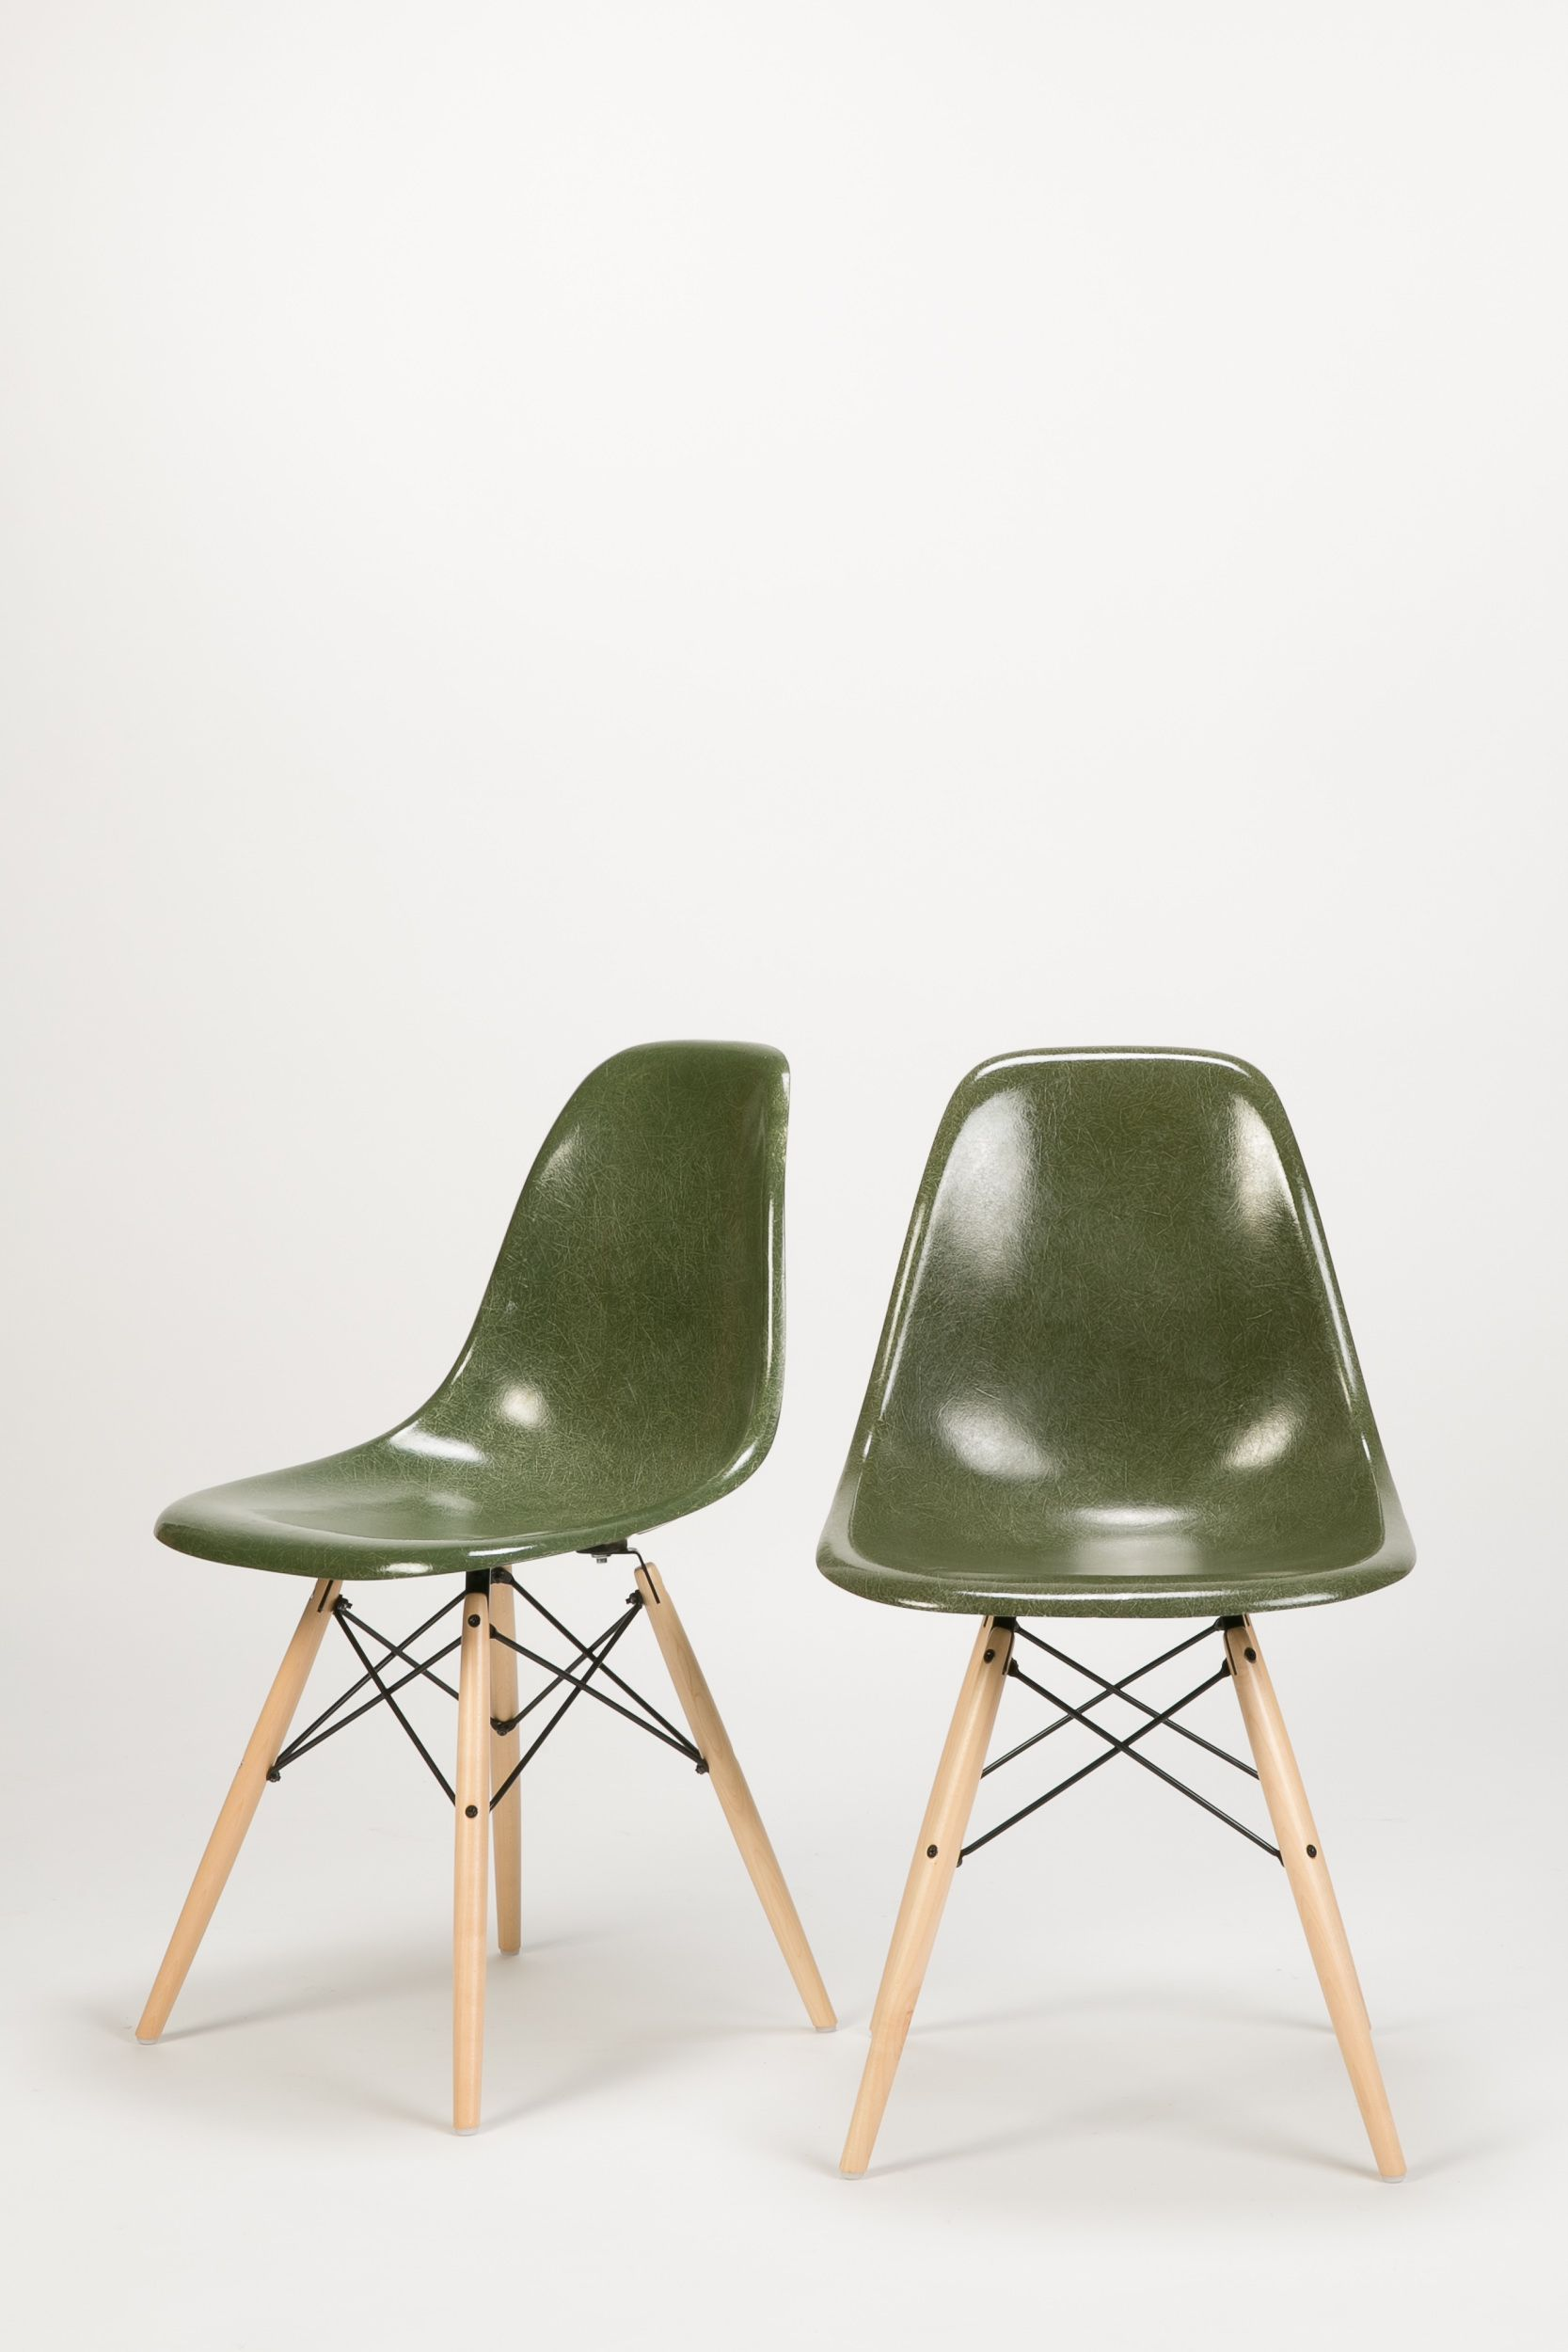 Sedia Vitra Dkr   La Sedia Dsw Vitra Dining Height Side Chair Wood Fa